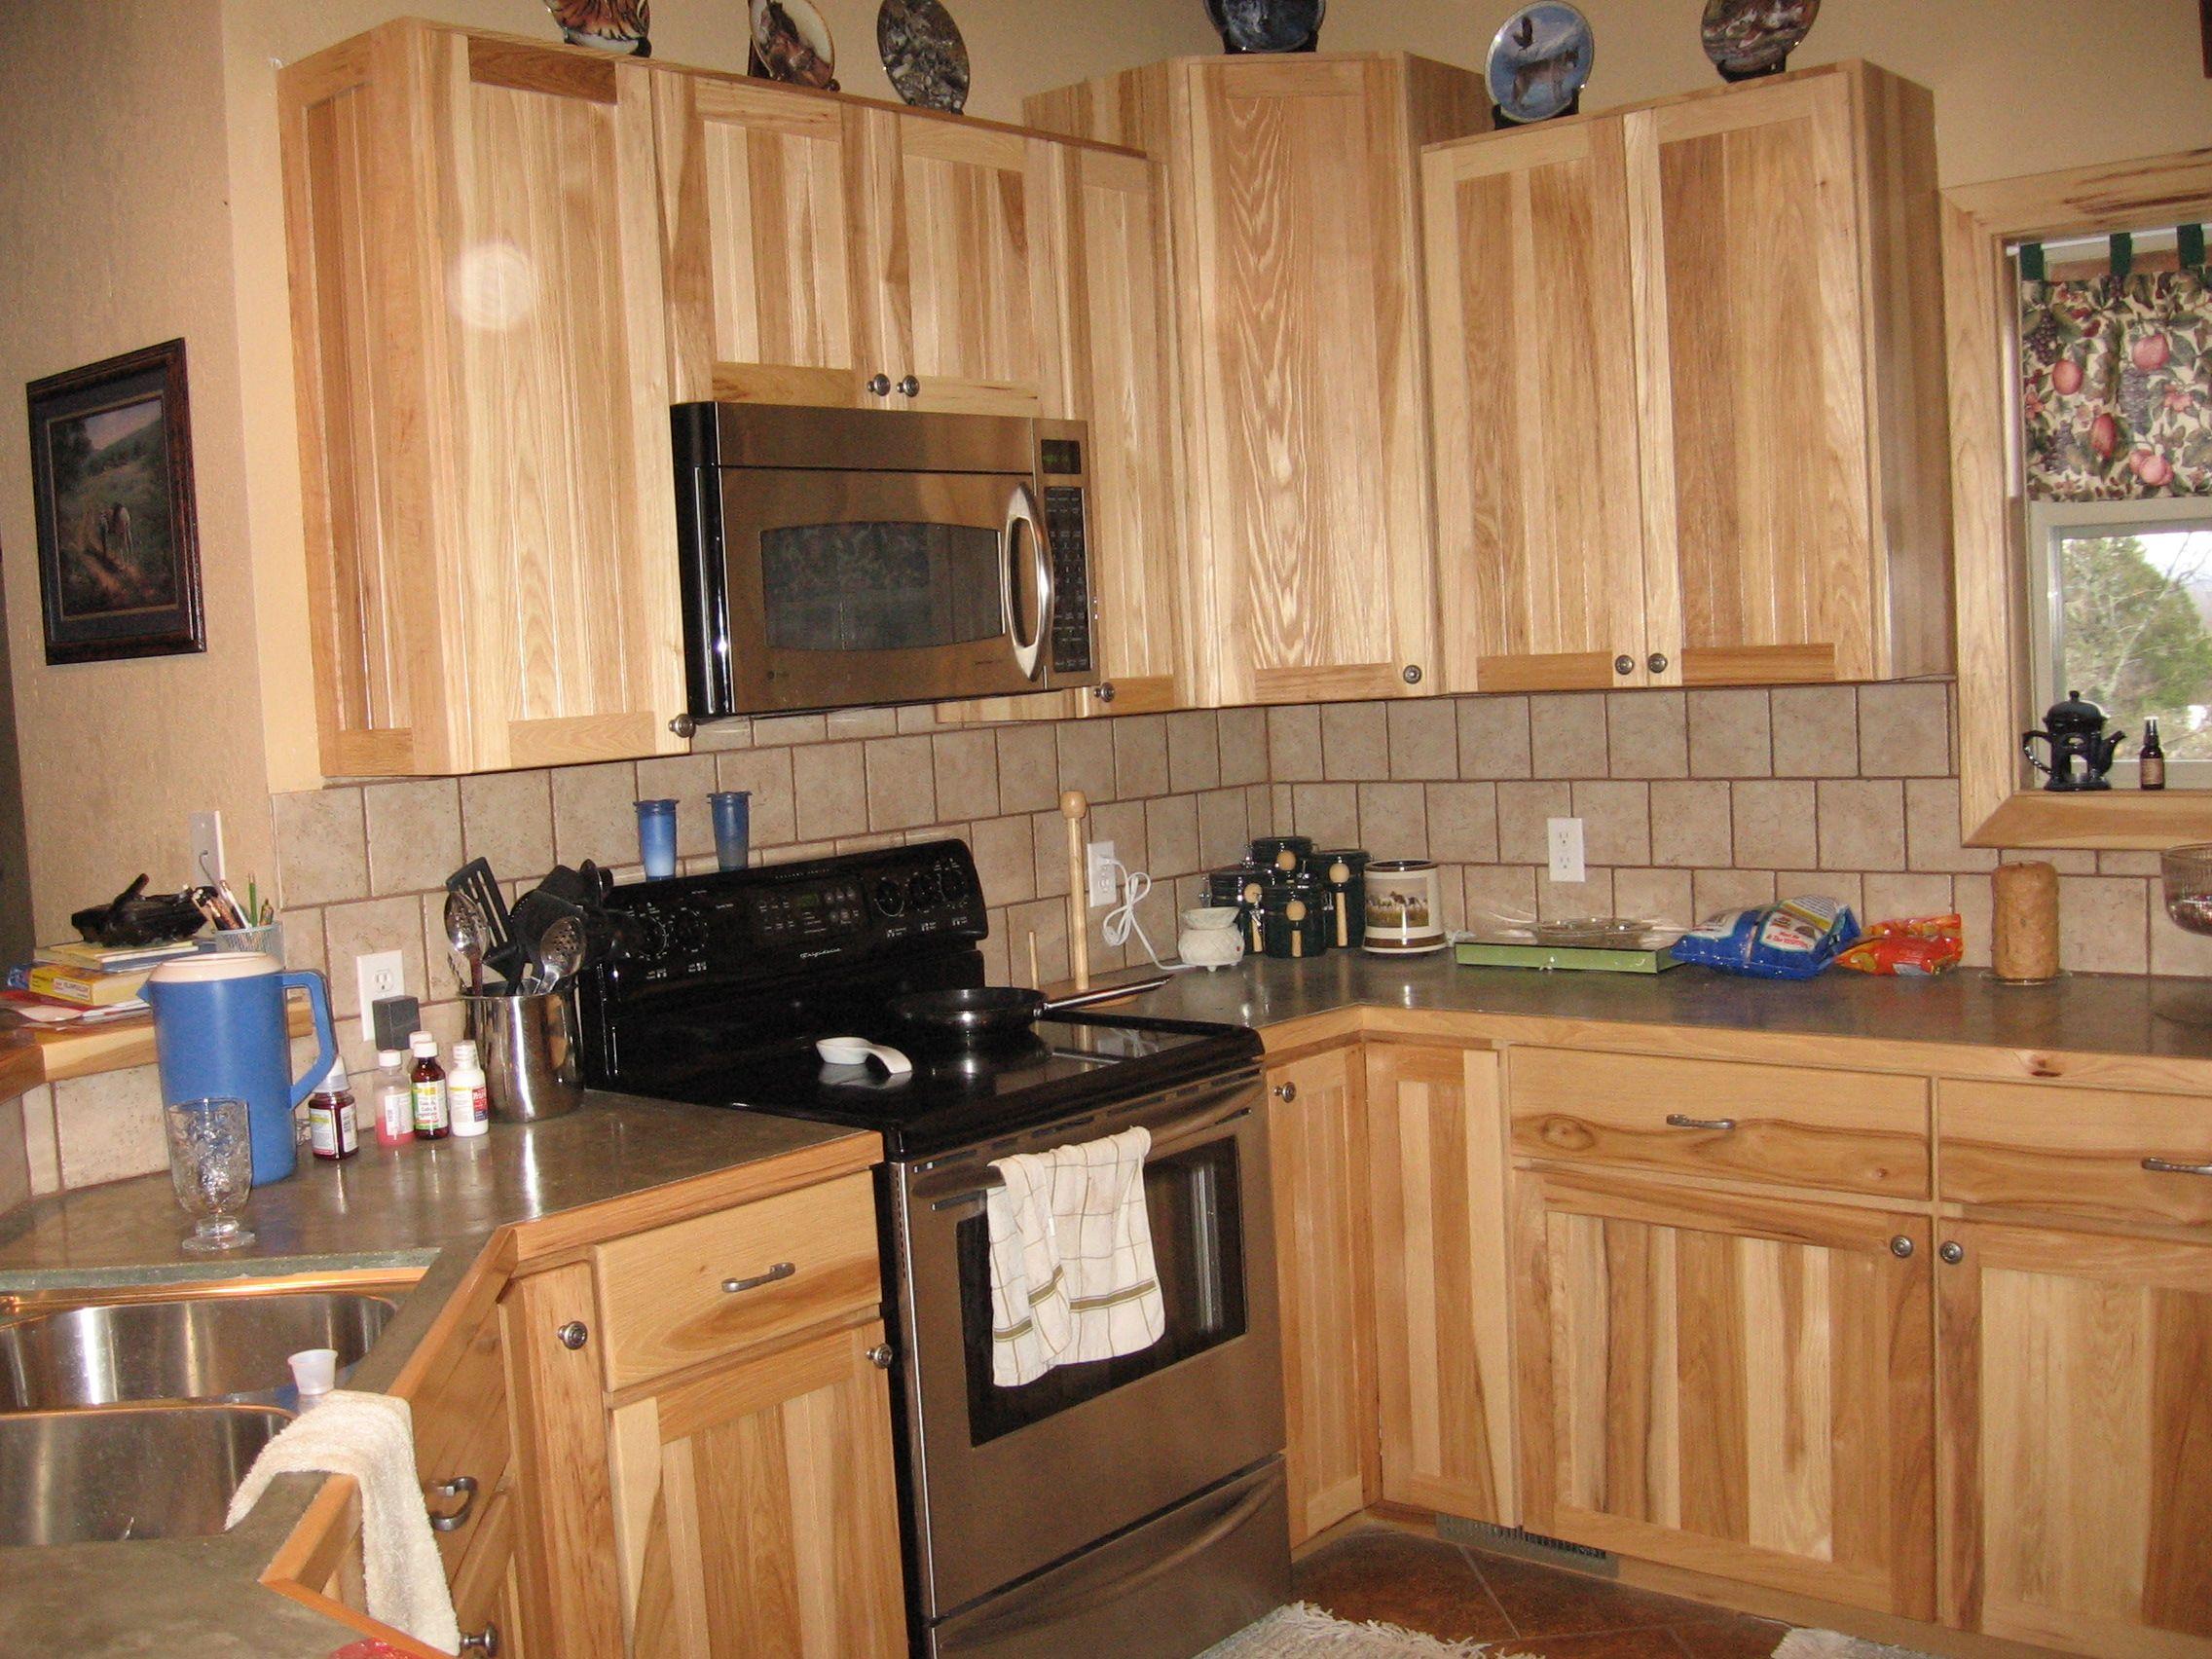 hampton natural hickory kitchen cabinets hampton bay kitchen cabinets hickory kitchen cabinets inc al other custom